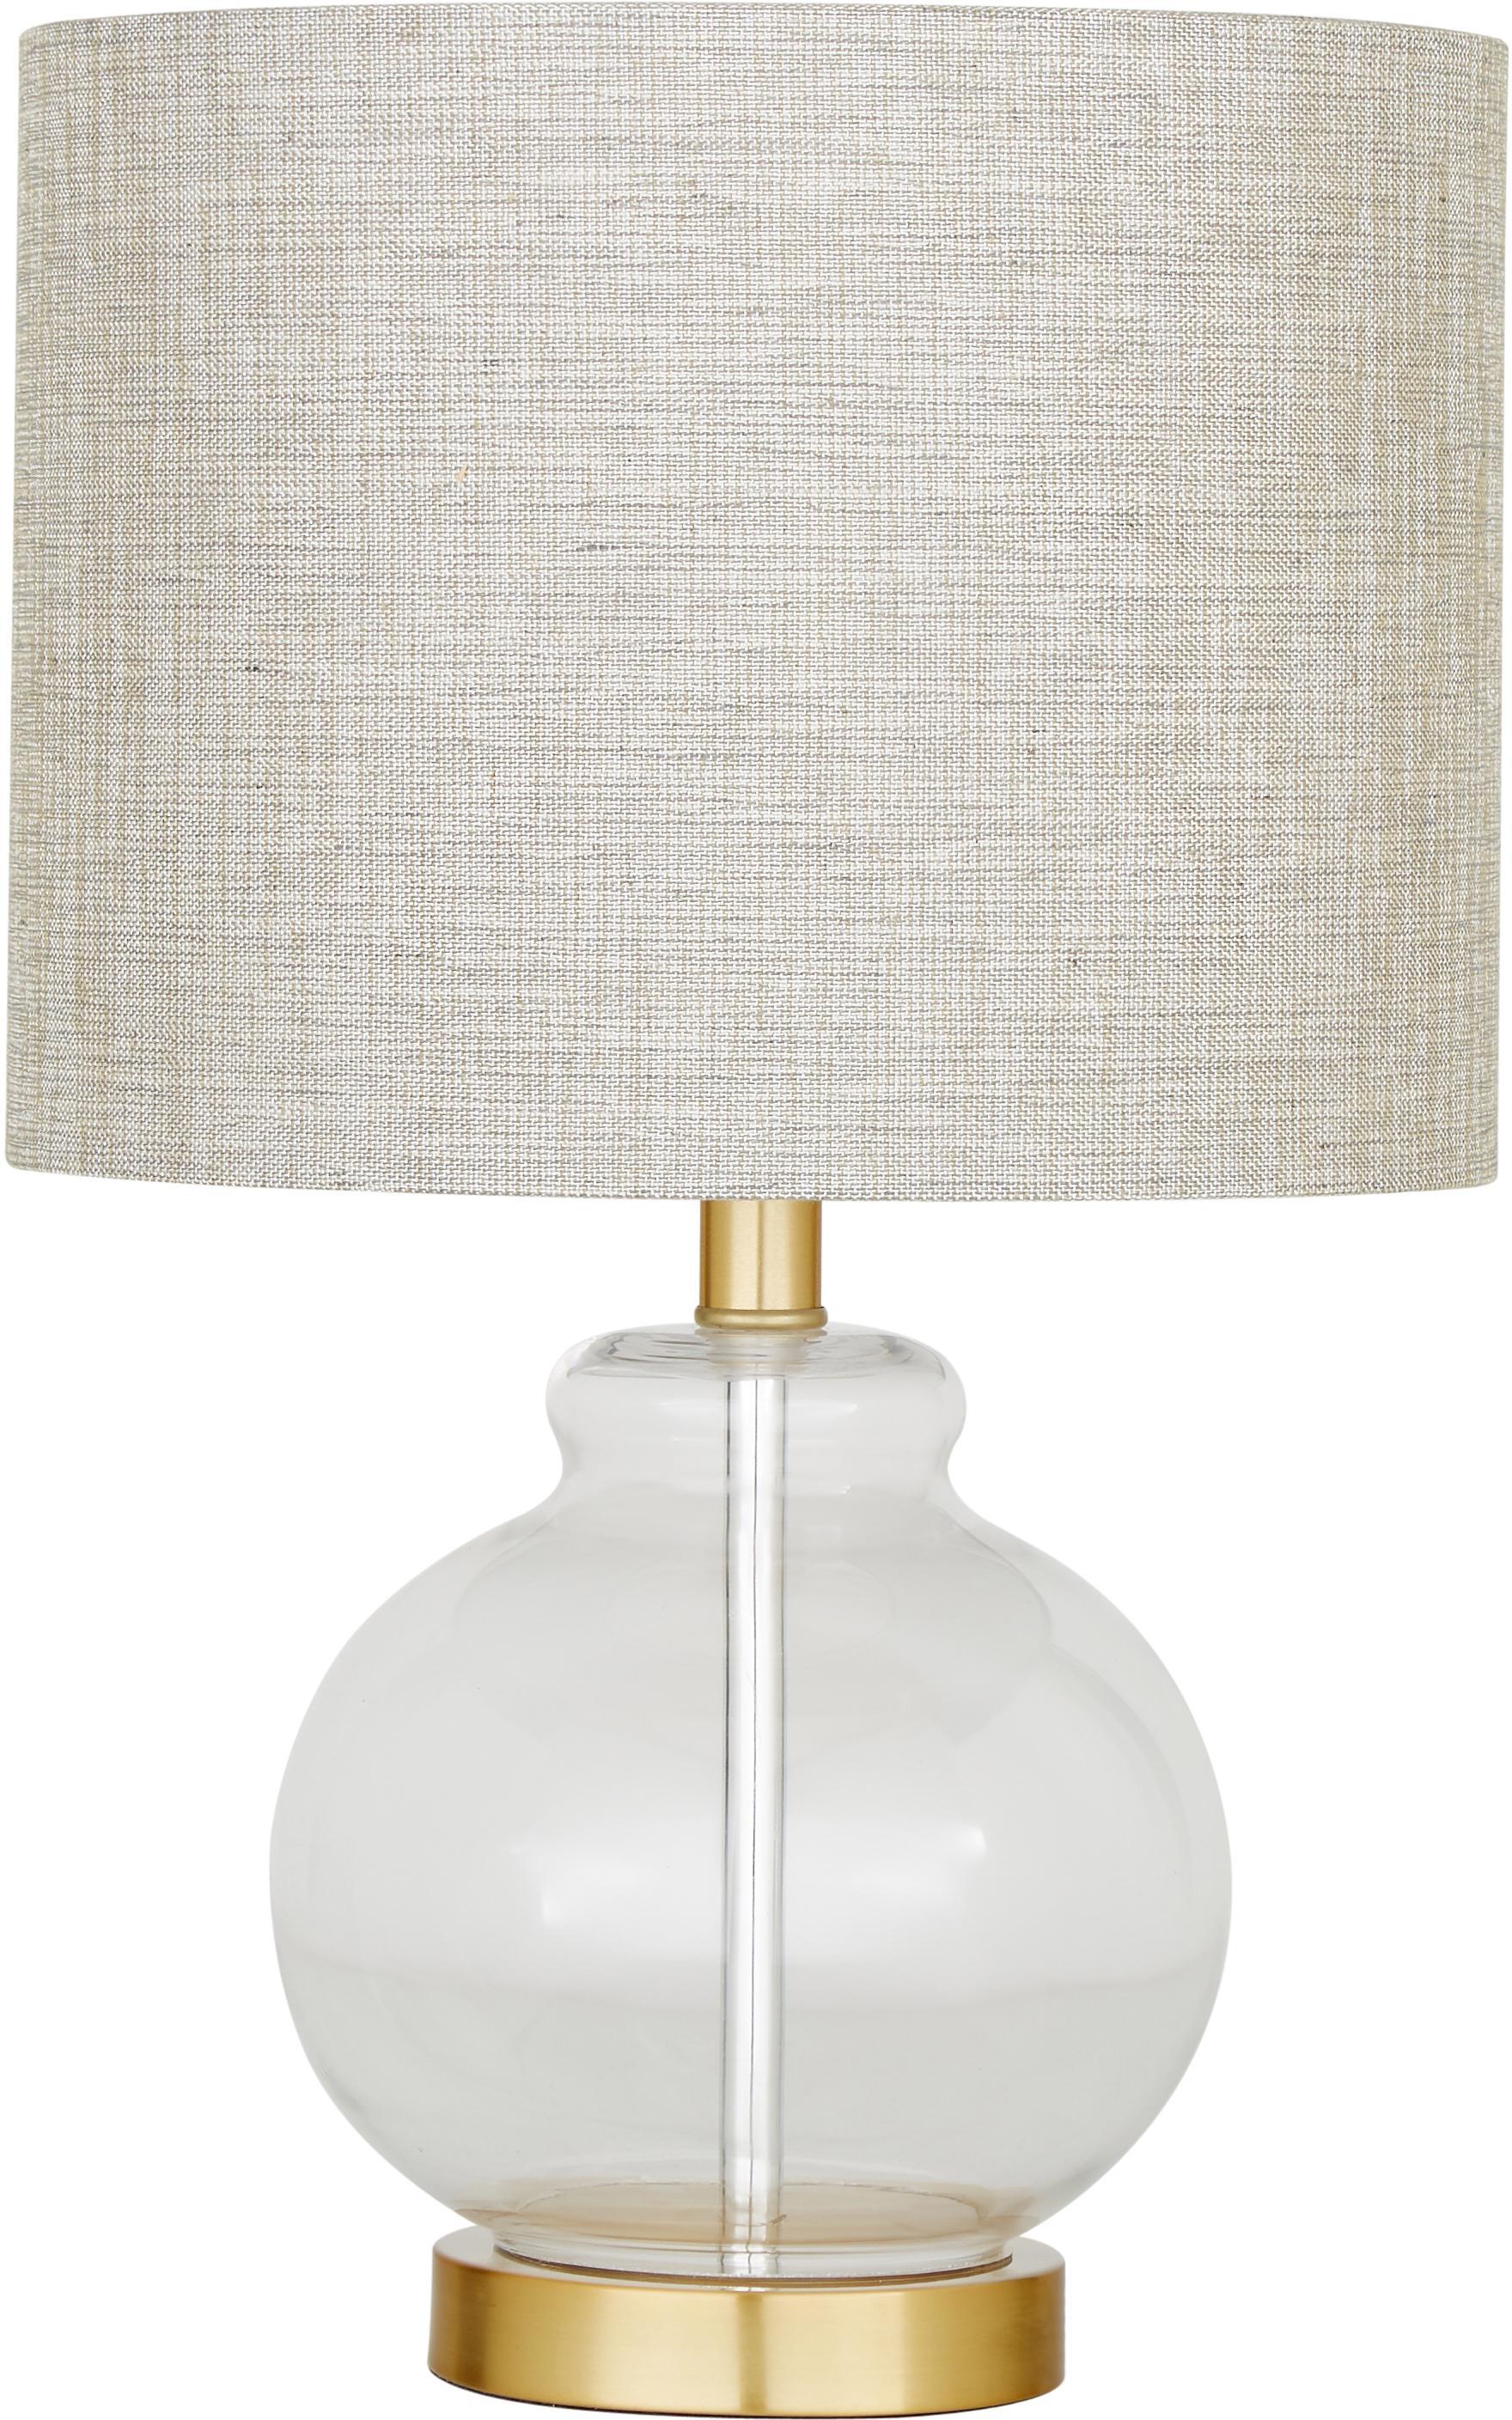 Tafellamp Natty, Lampenkap: textiel, Lampvoet: glas, geborsteld messing, Taupe, transparant, Ø 31 x H 48 cm